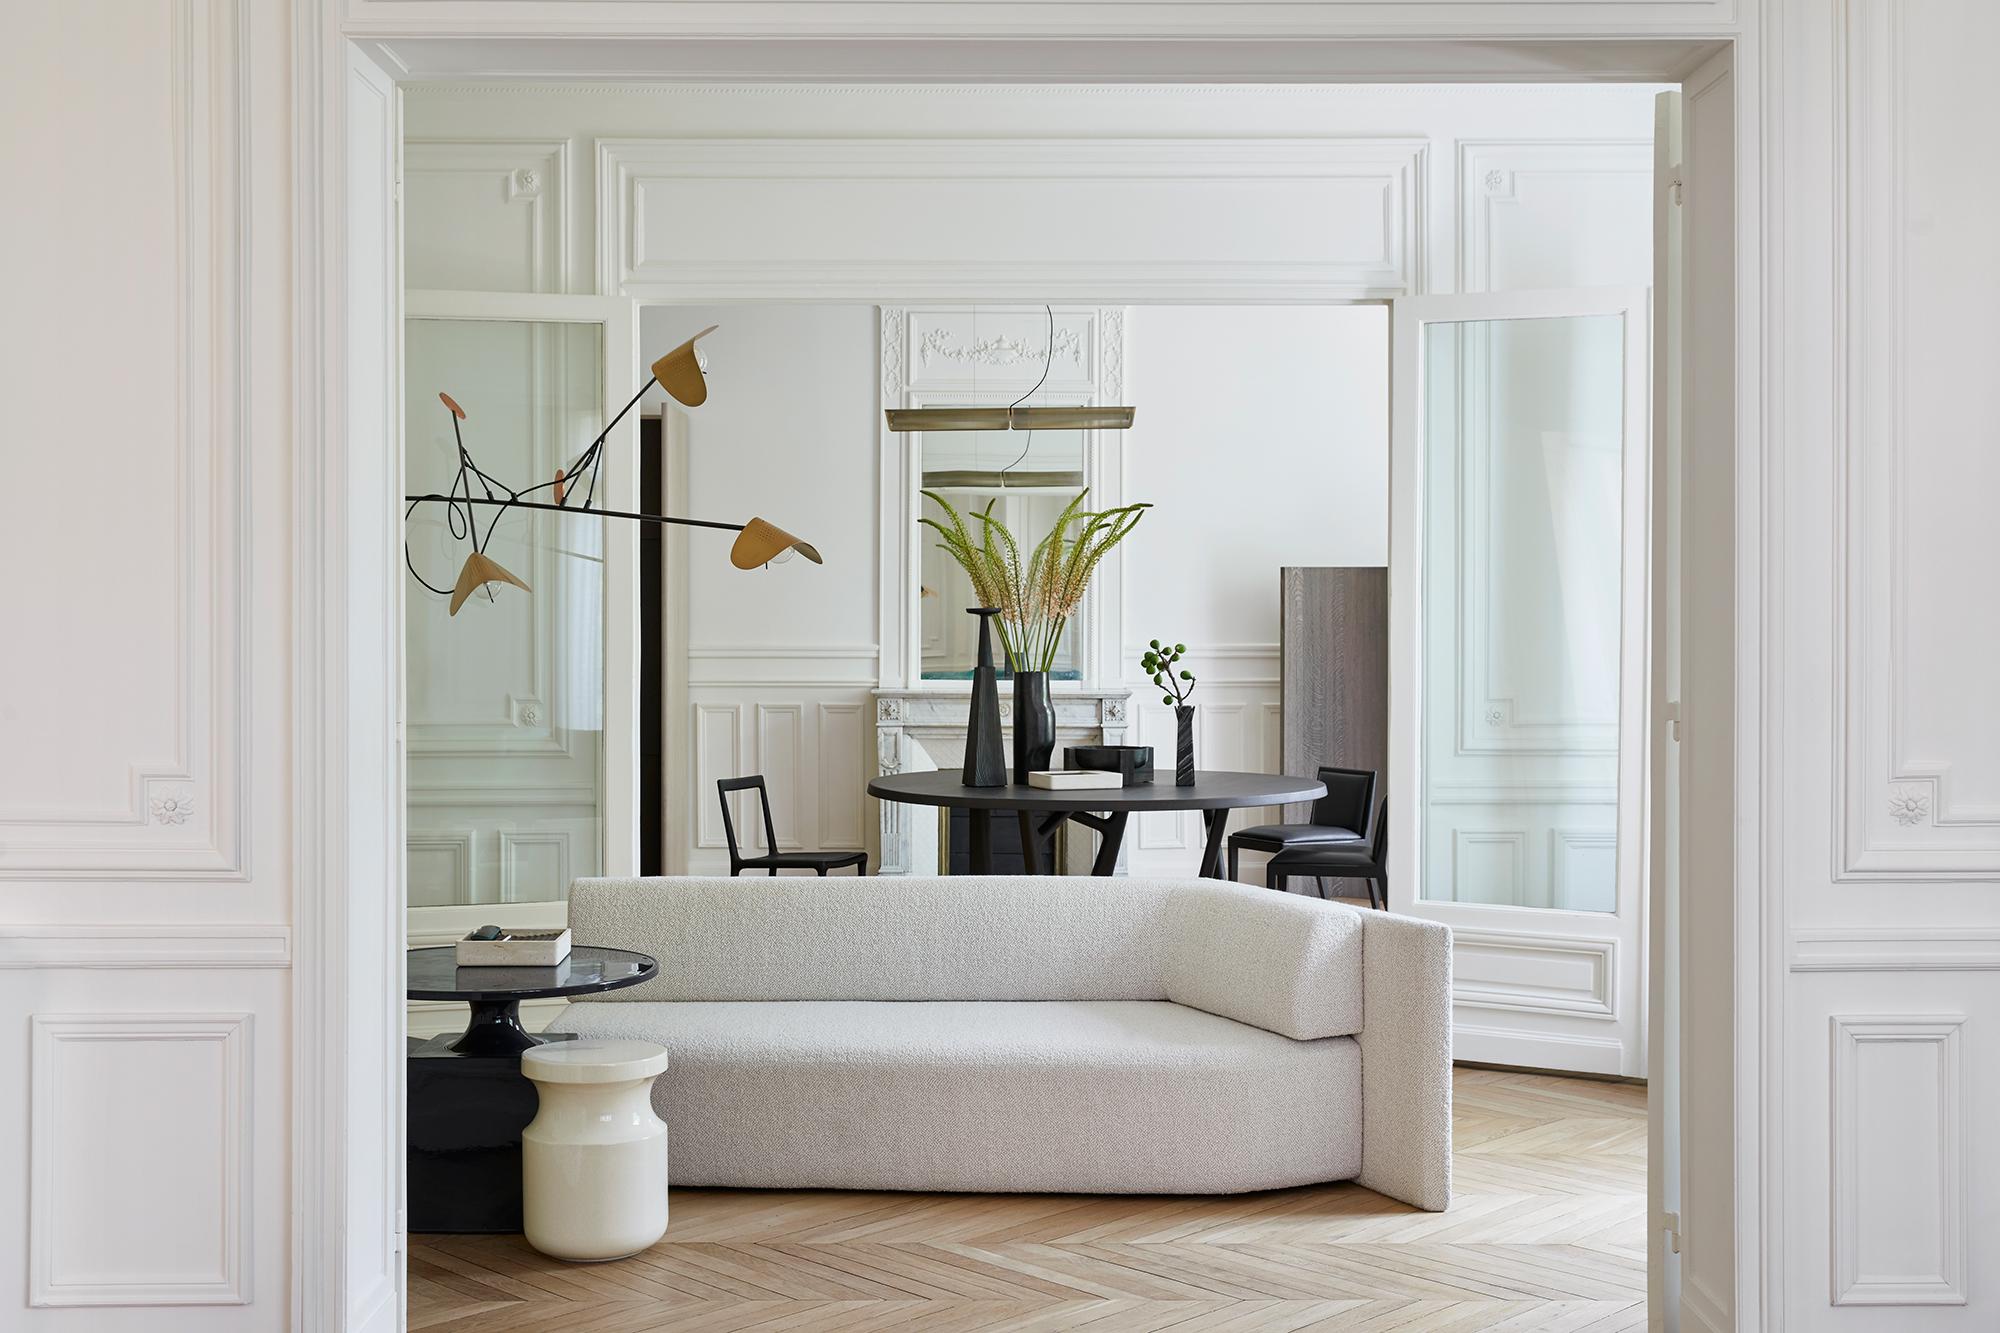 Declourt Collection - EKO sofa - OUK & DOT side table